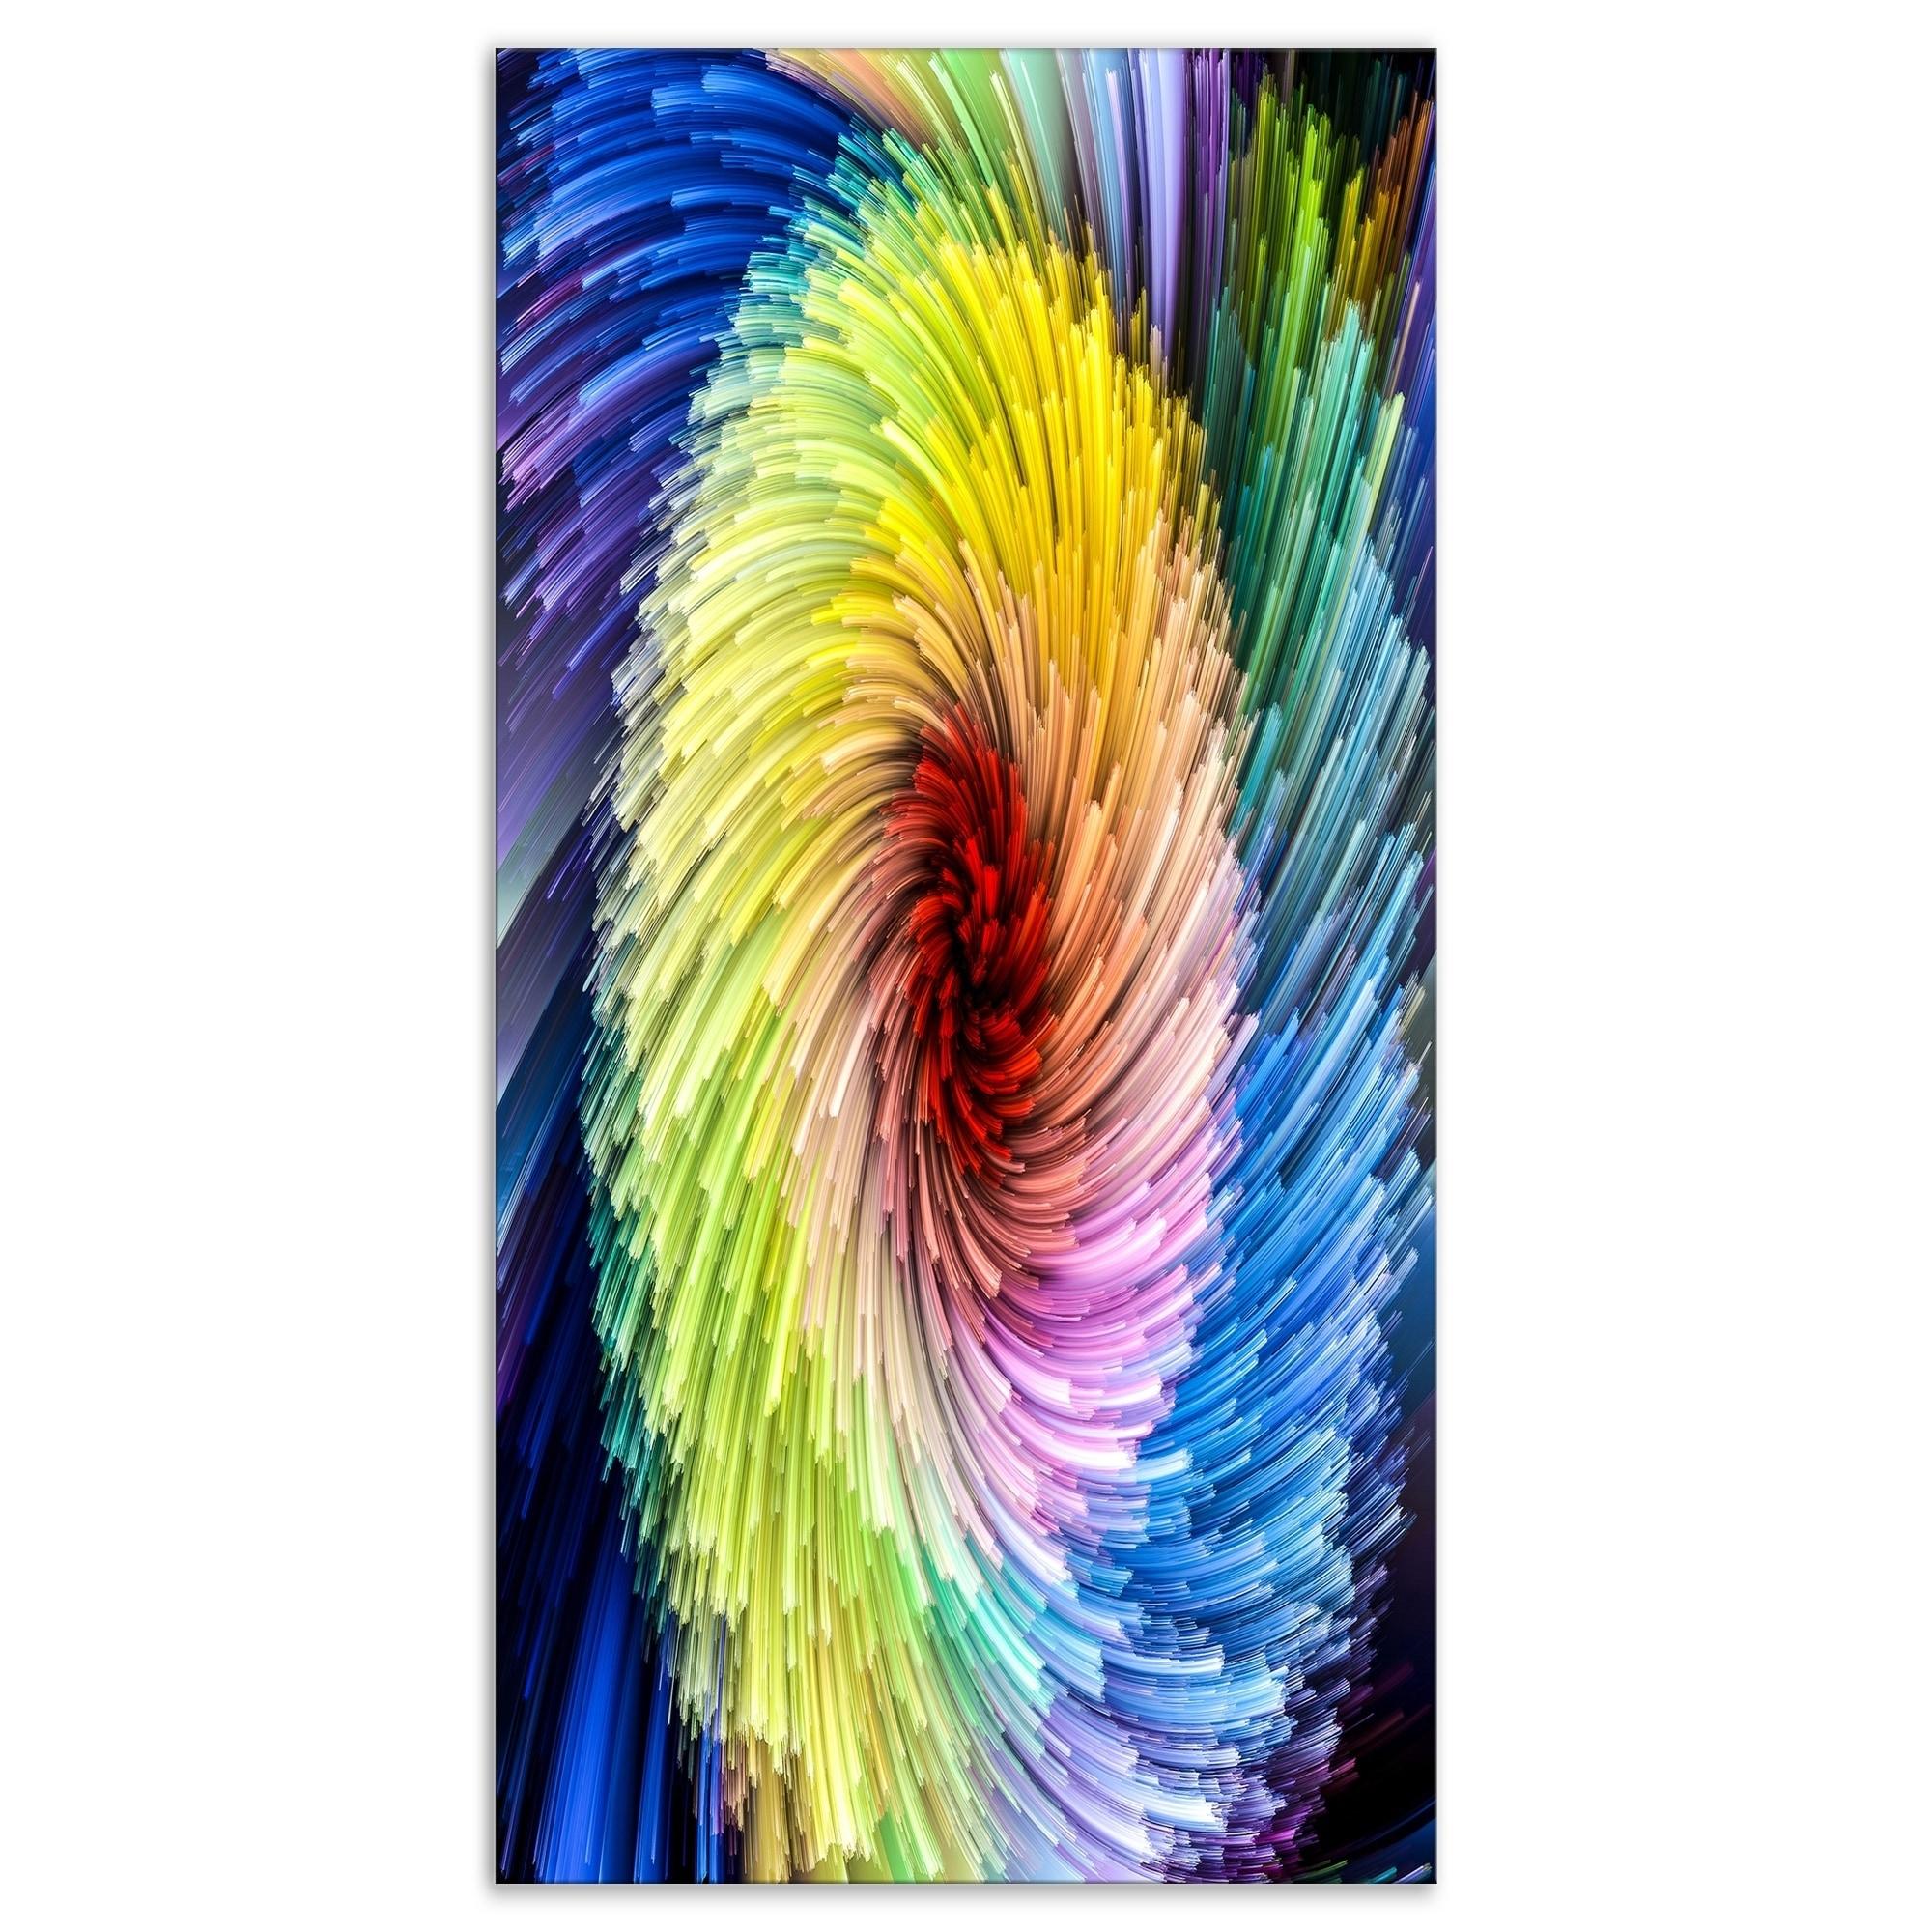 Designart Virtual Vibrant Vortex Contemporary Art On Wrapped Canvas Overstock 21275554